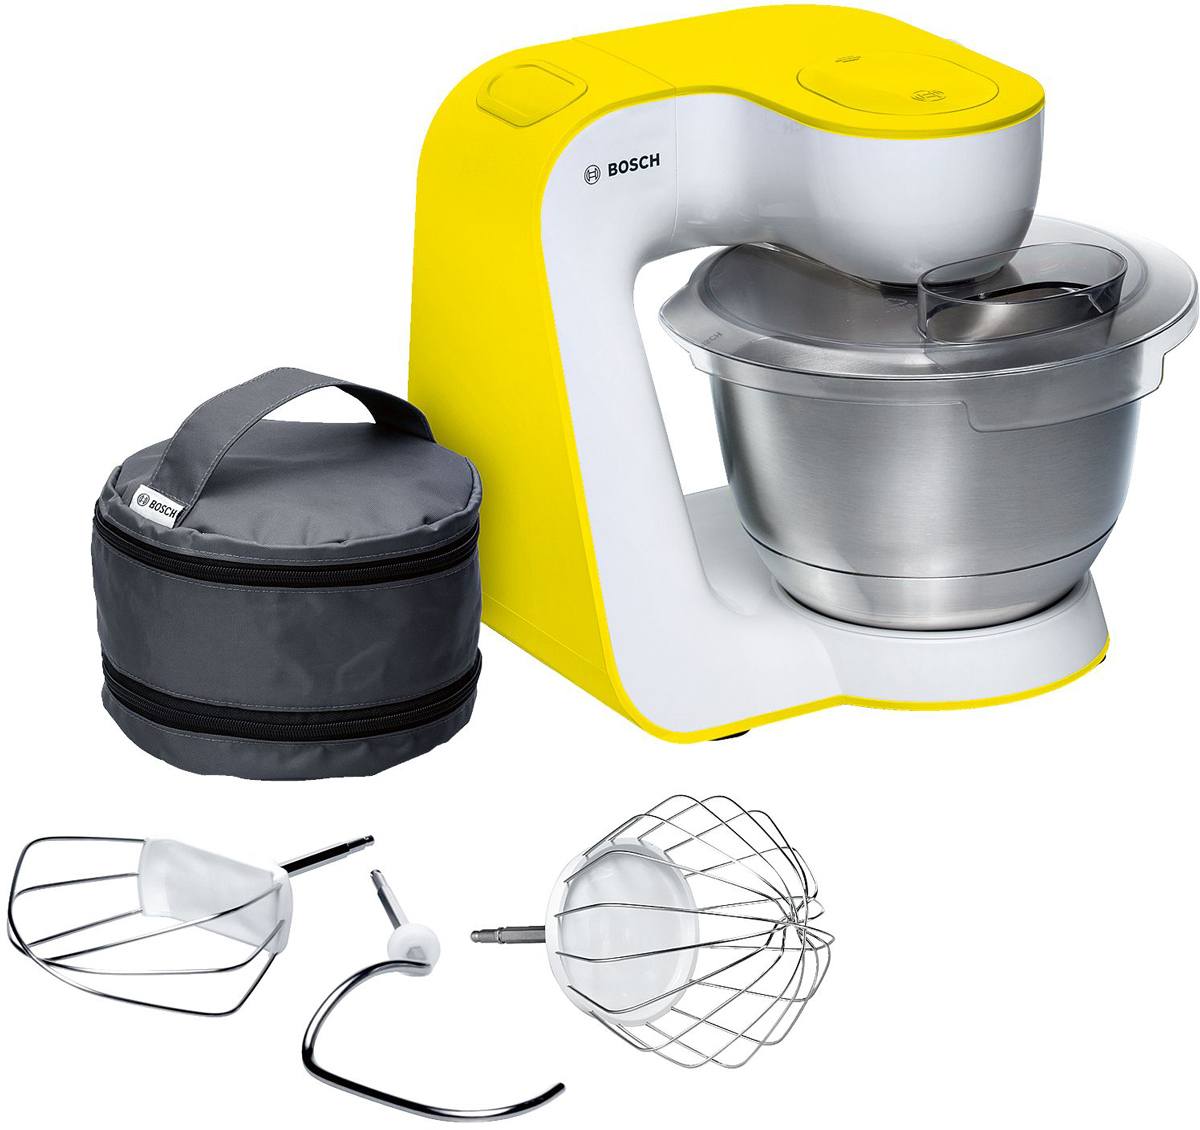 Bosch MUM54Y00 кухонный комбайн - Комбайны и мясорубки